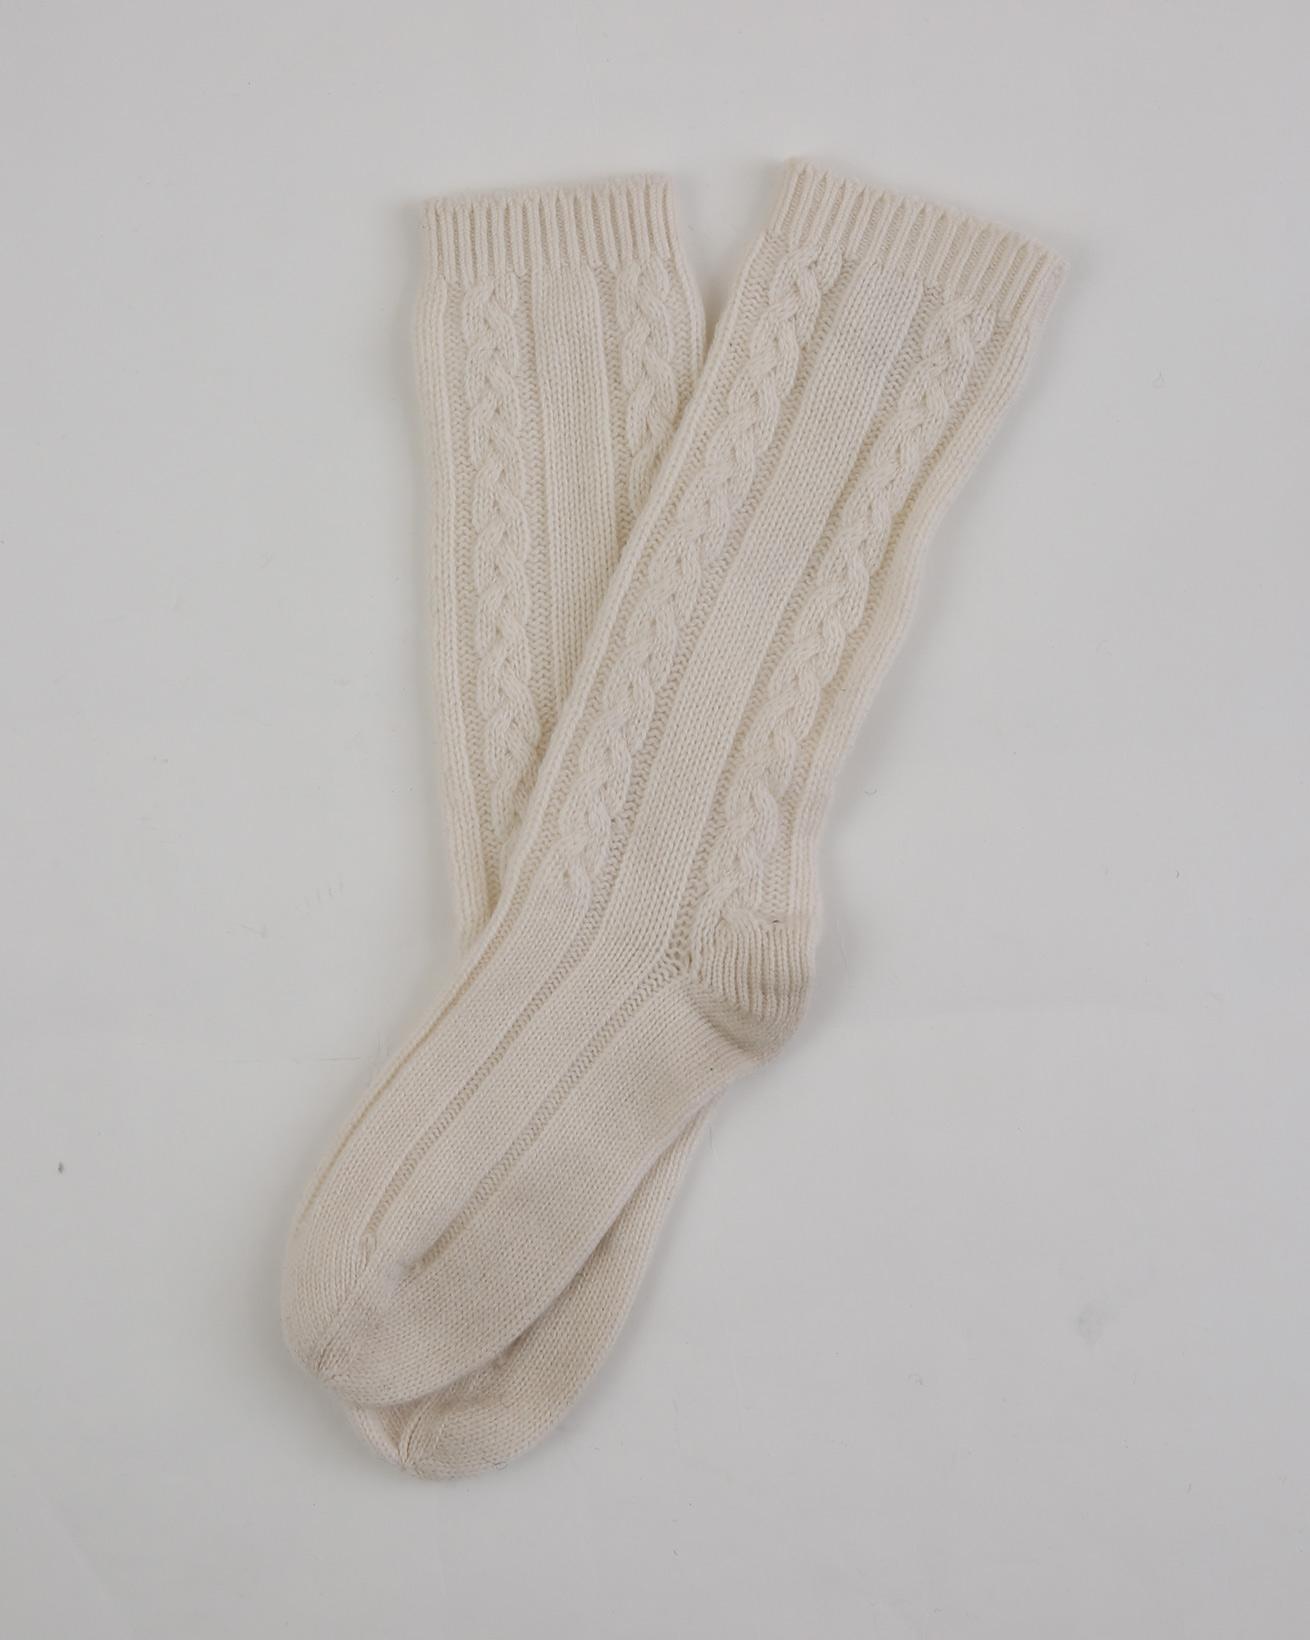 Cashmere Sleep Socks - One Size - Ecru - 1956